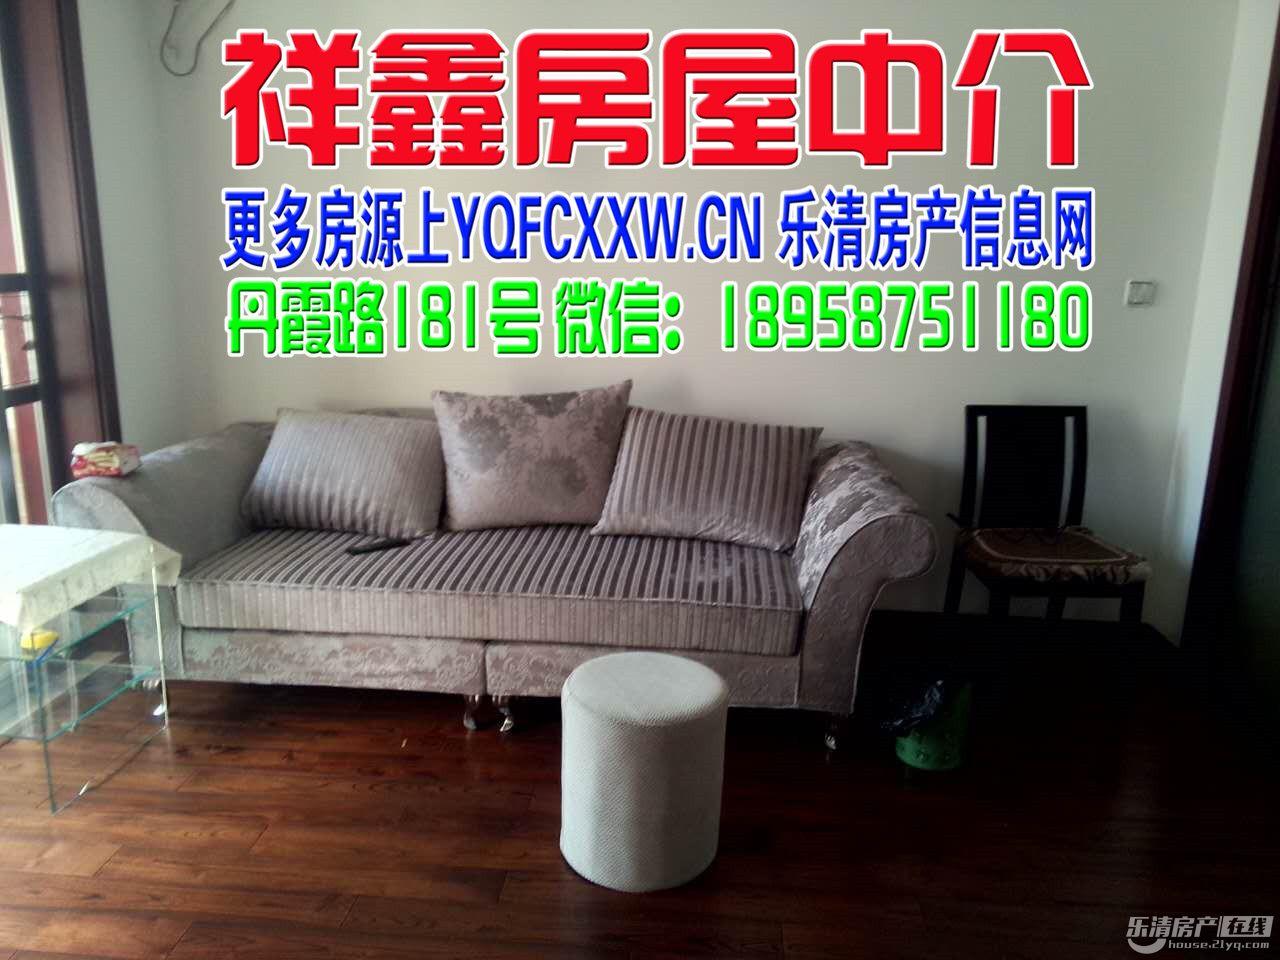 http://house.21yq.com/userfiles/image/20160630/30141150f230de38a24192.jpg